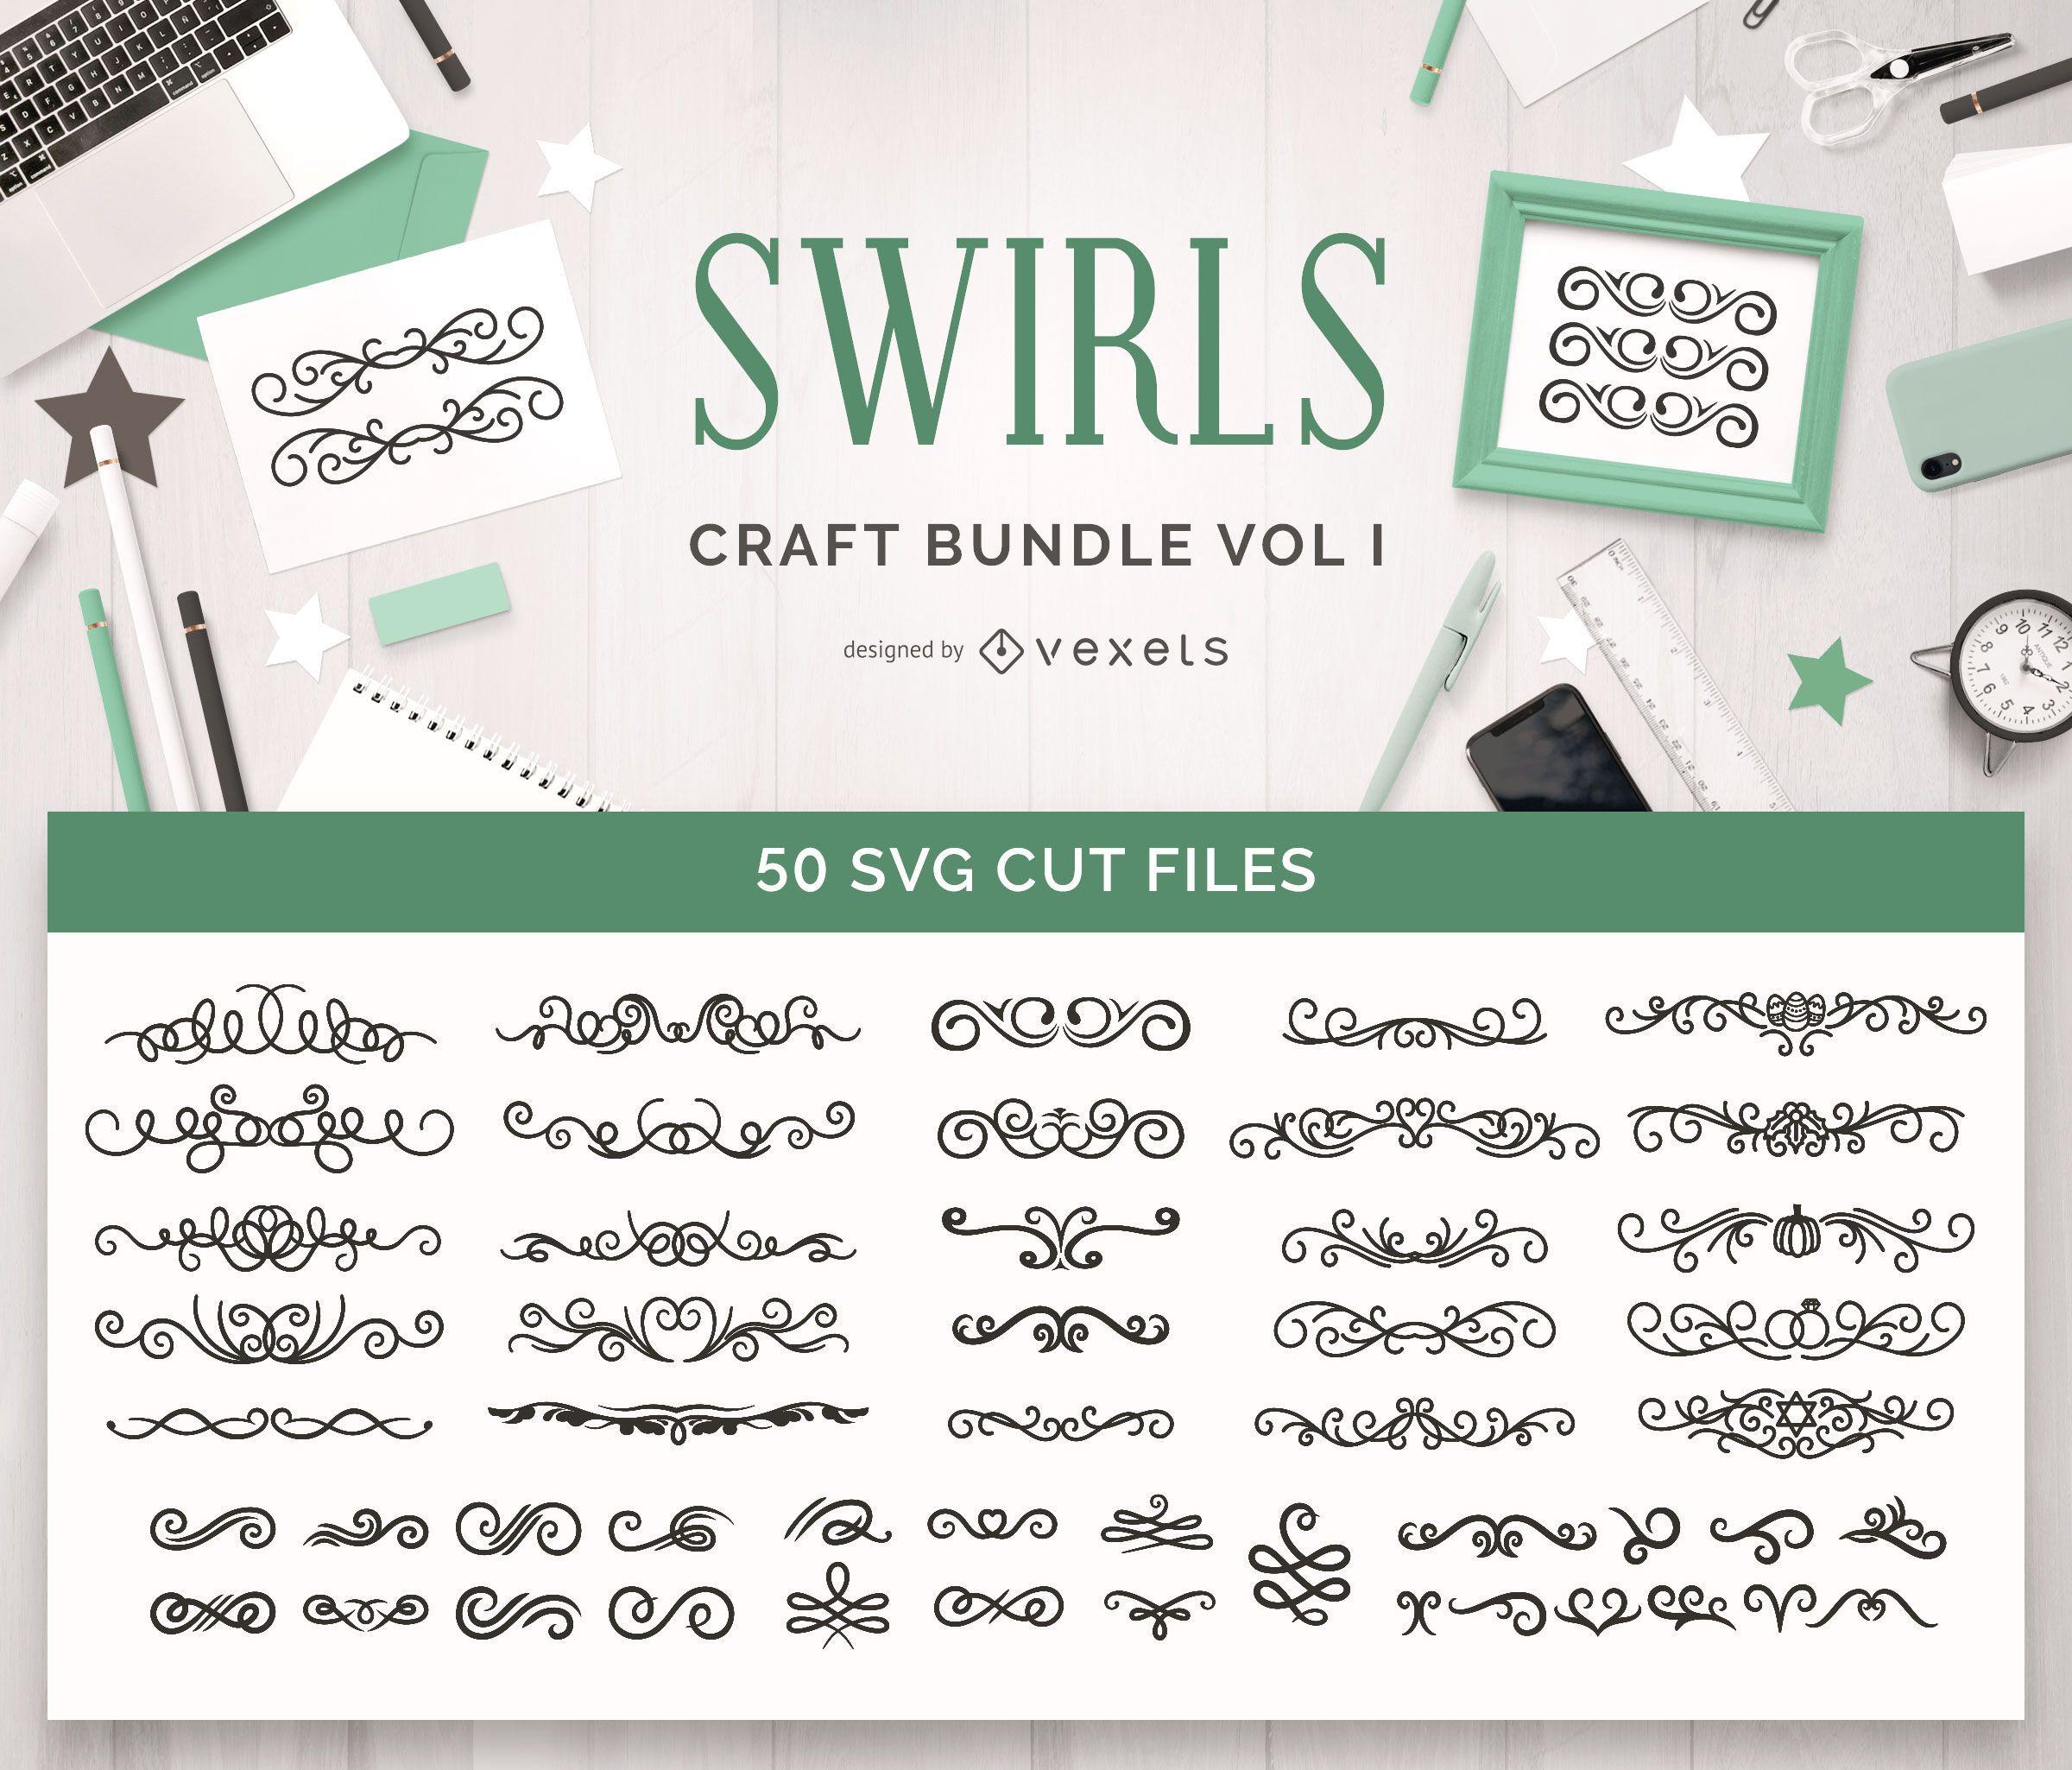 Swirls Craft Bundle Vol 1